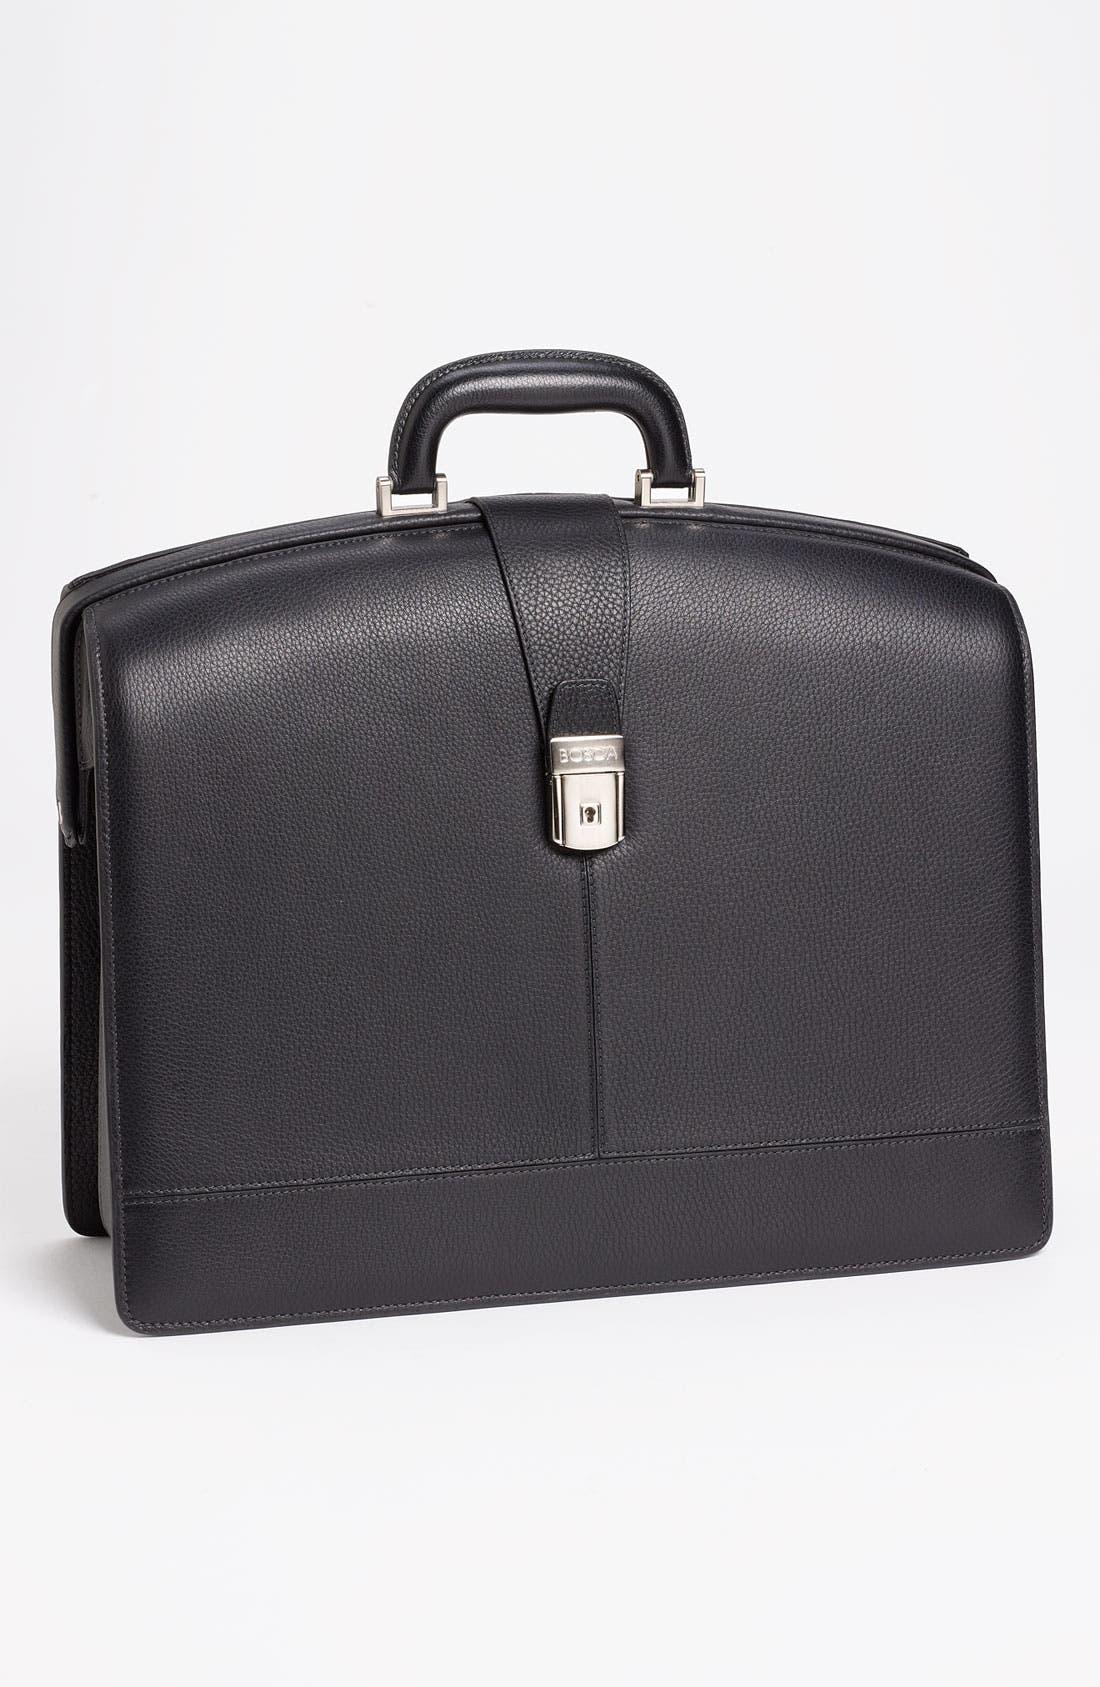 Main Image - Bosca 'Partners' Briefcase